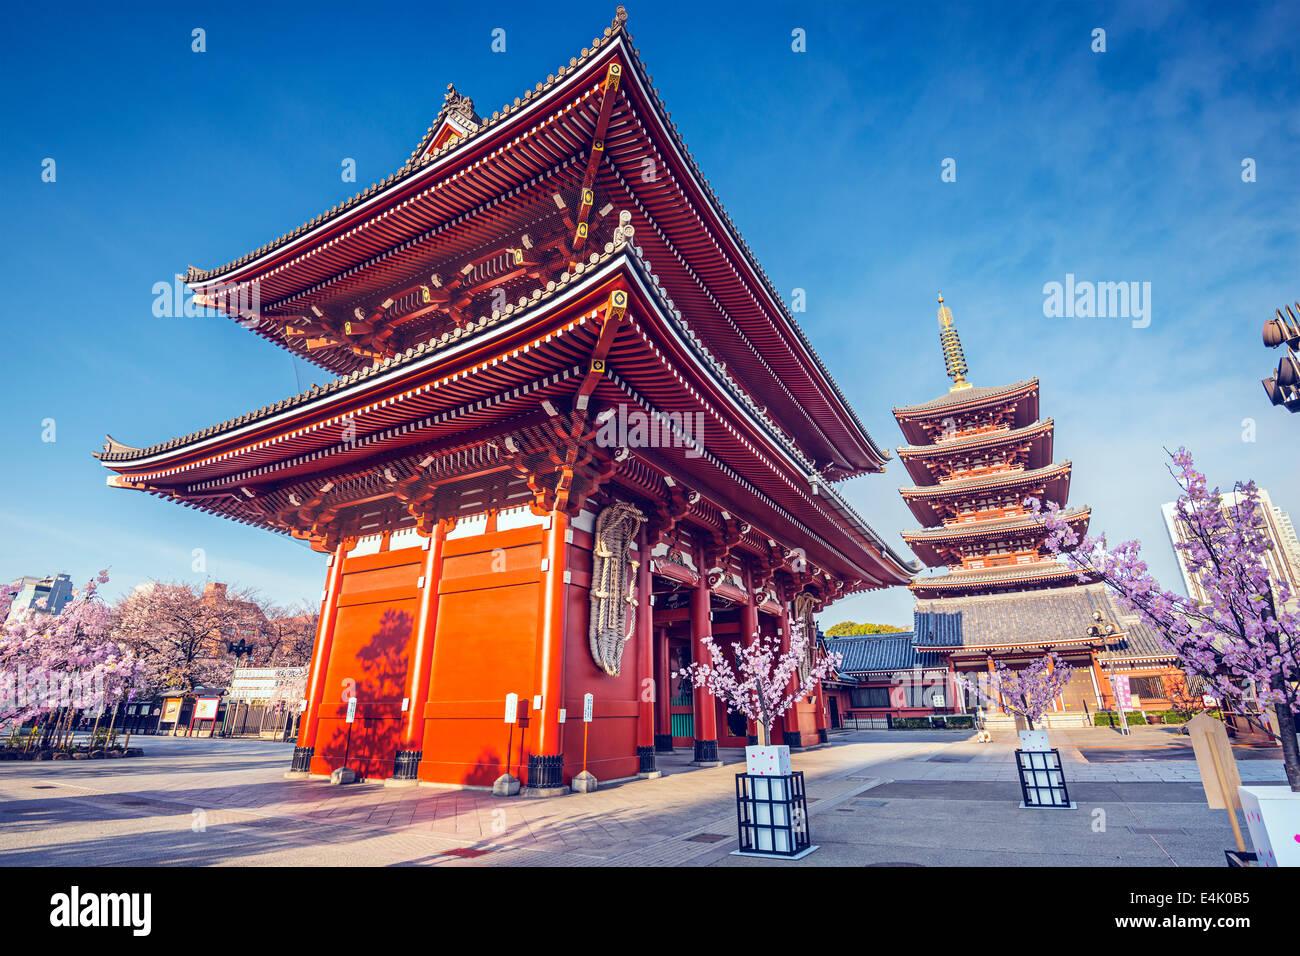 Senso-ji Temple in Asakusa, Tokyo, Japan. - Stock Image